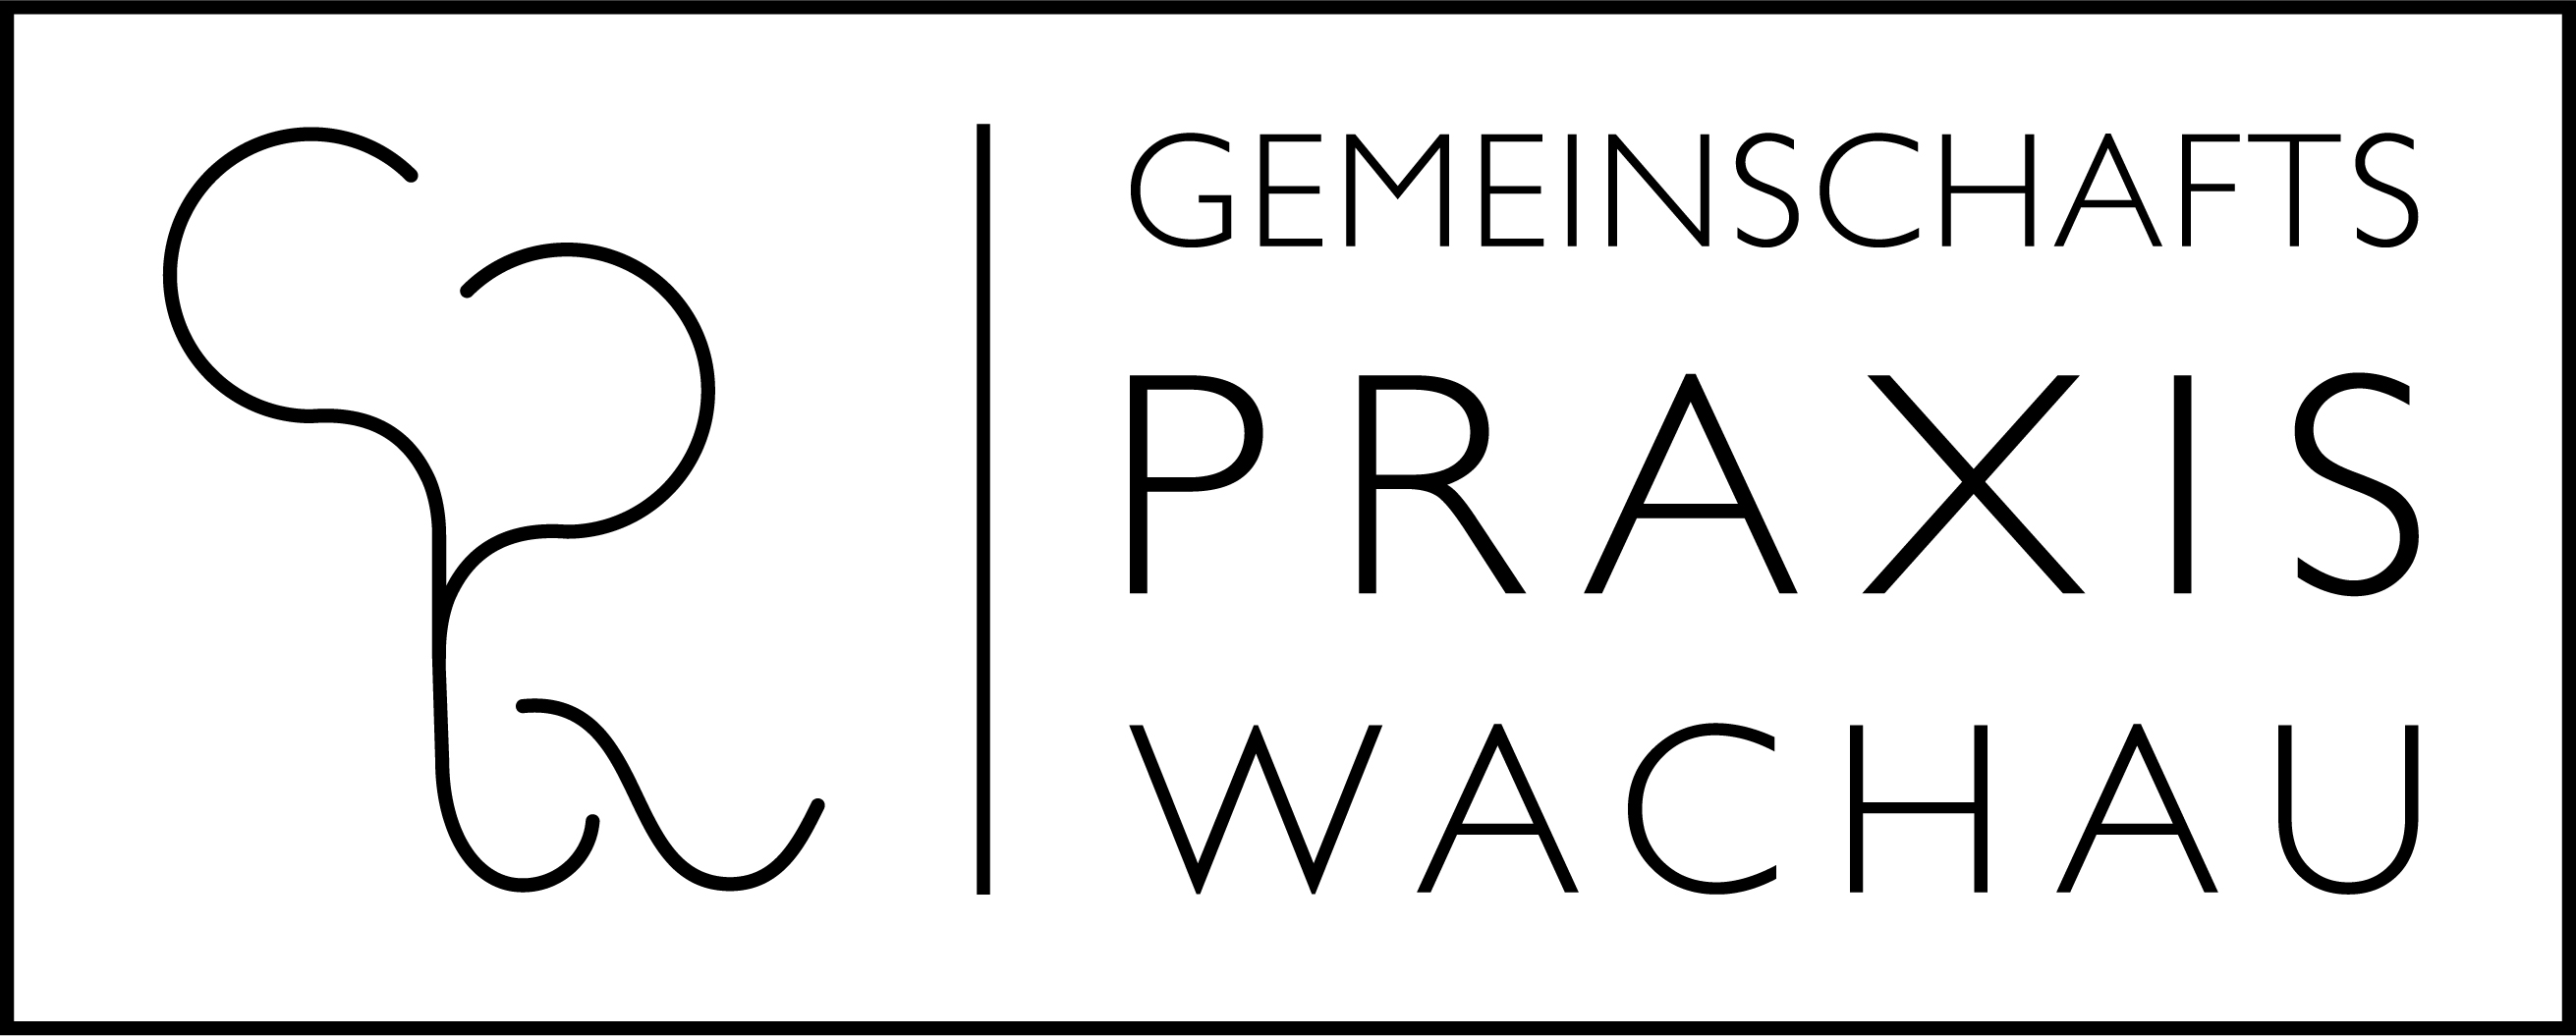 Gemeinschaftspraxis Wachau